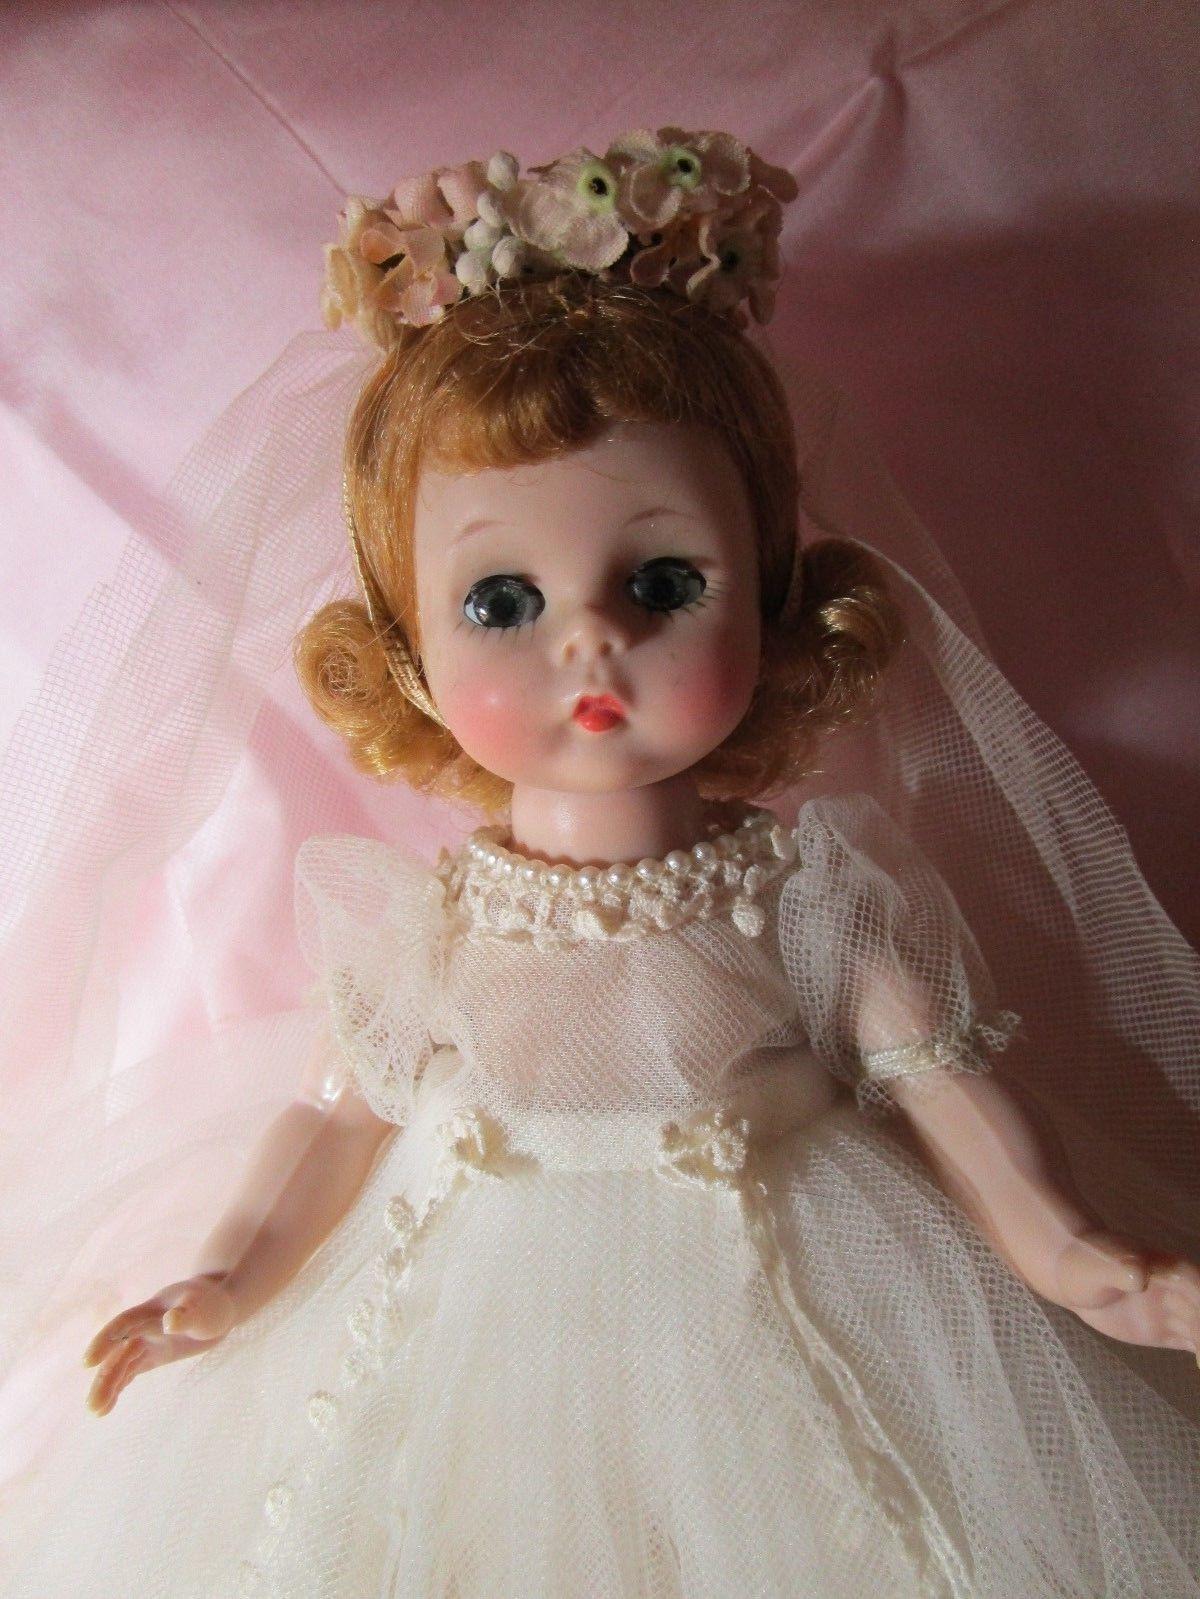 Alexander-Kin Bride BKW blonde ***GORGEOUS DOLL*** WREATH STYLE*** in Dolls & Bears, Dolls, By Brand, Company, Character, Madame Alexander, Vintage (Pre-1973), 1948-59 | eBay